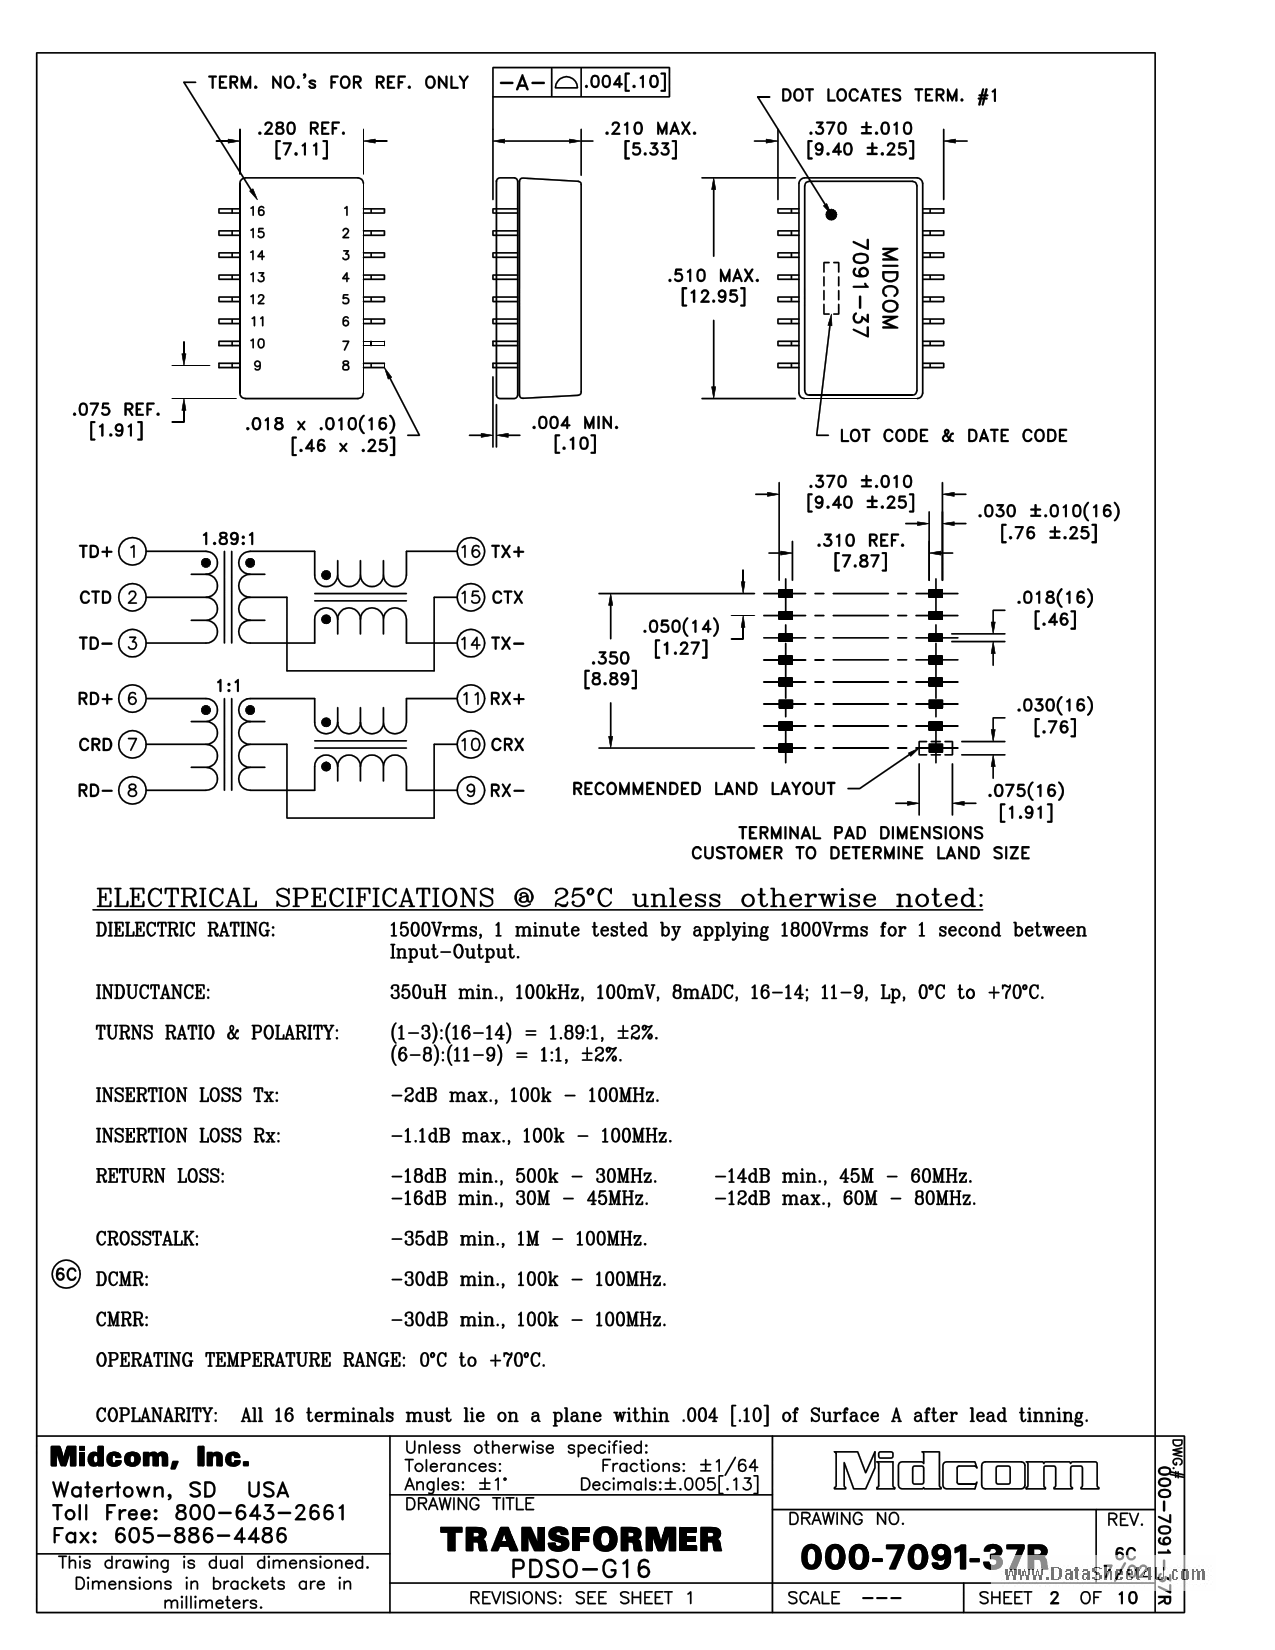 000-7091-37R datasheet